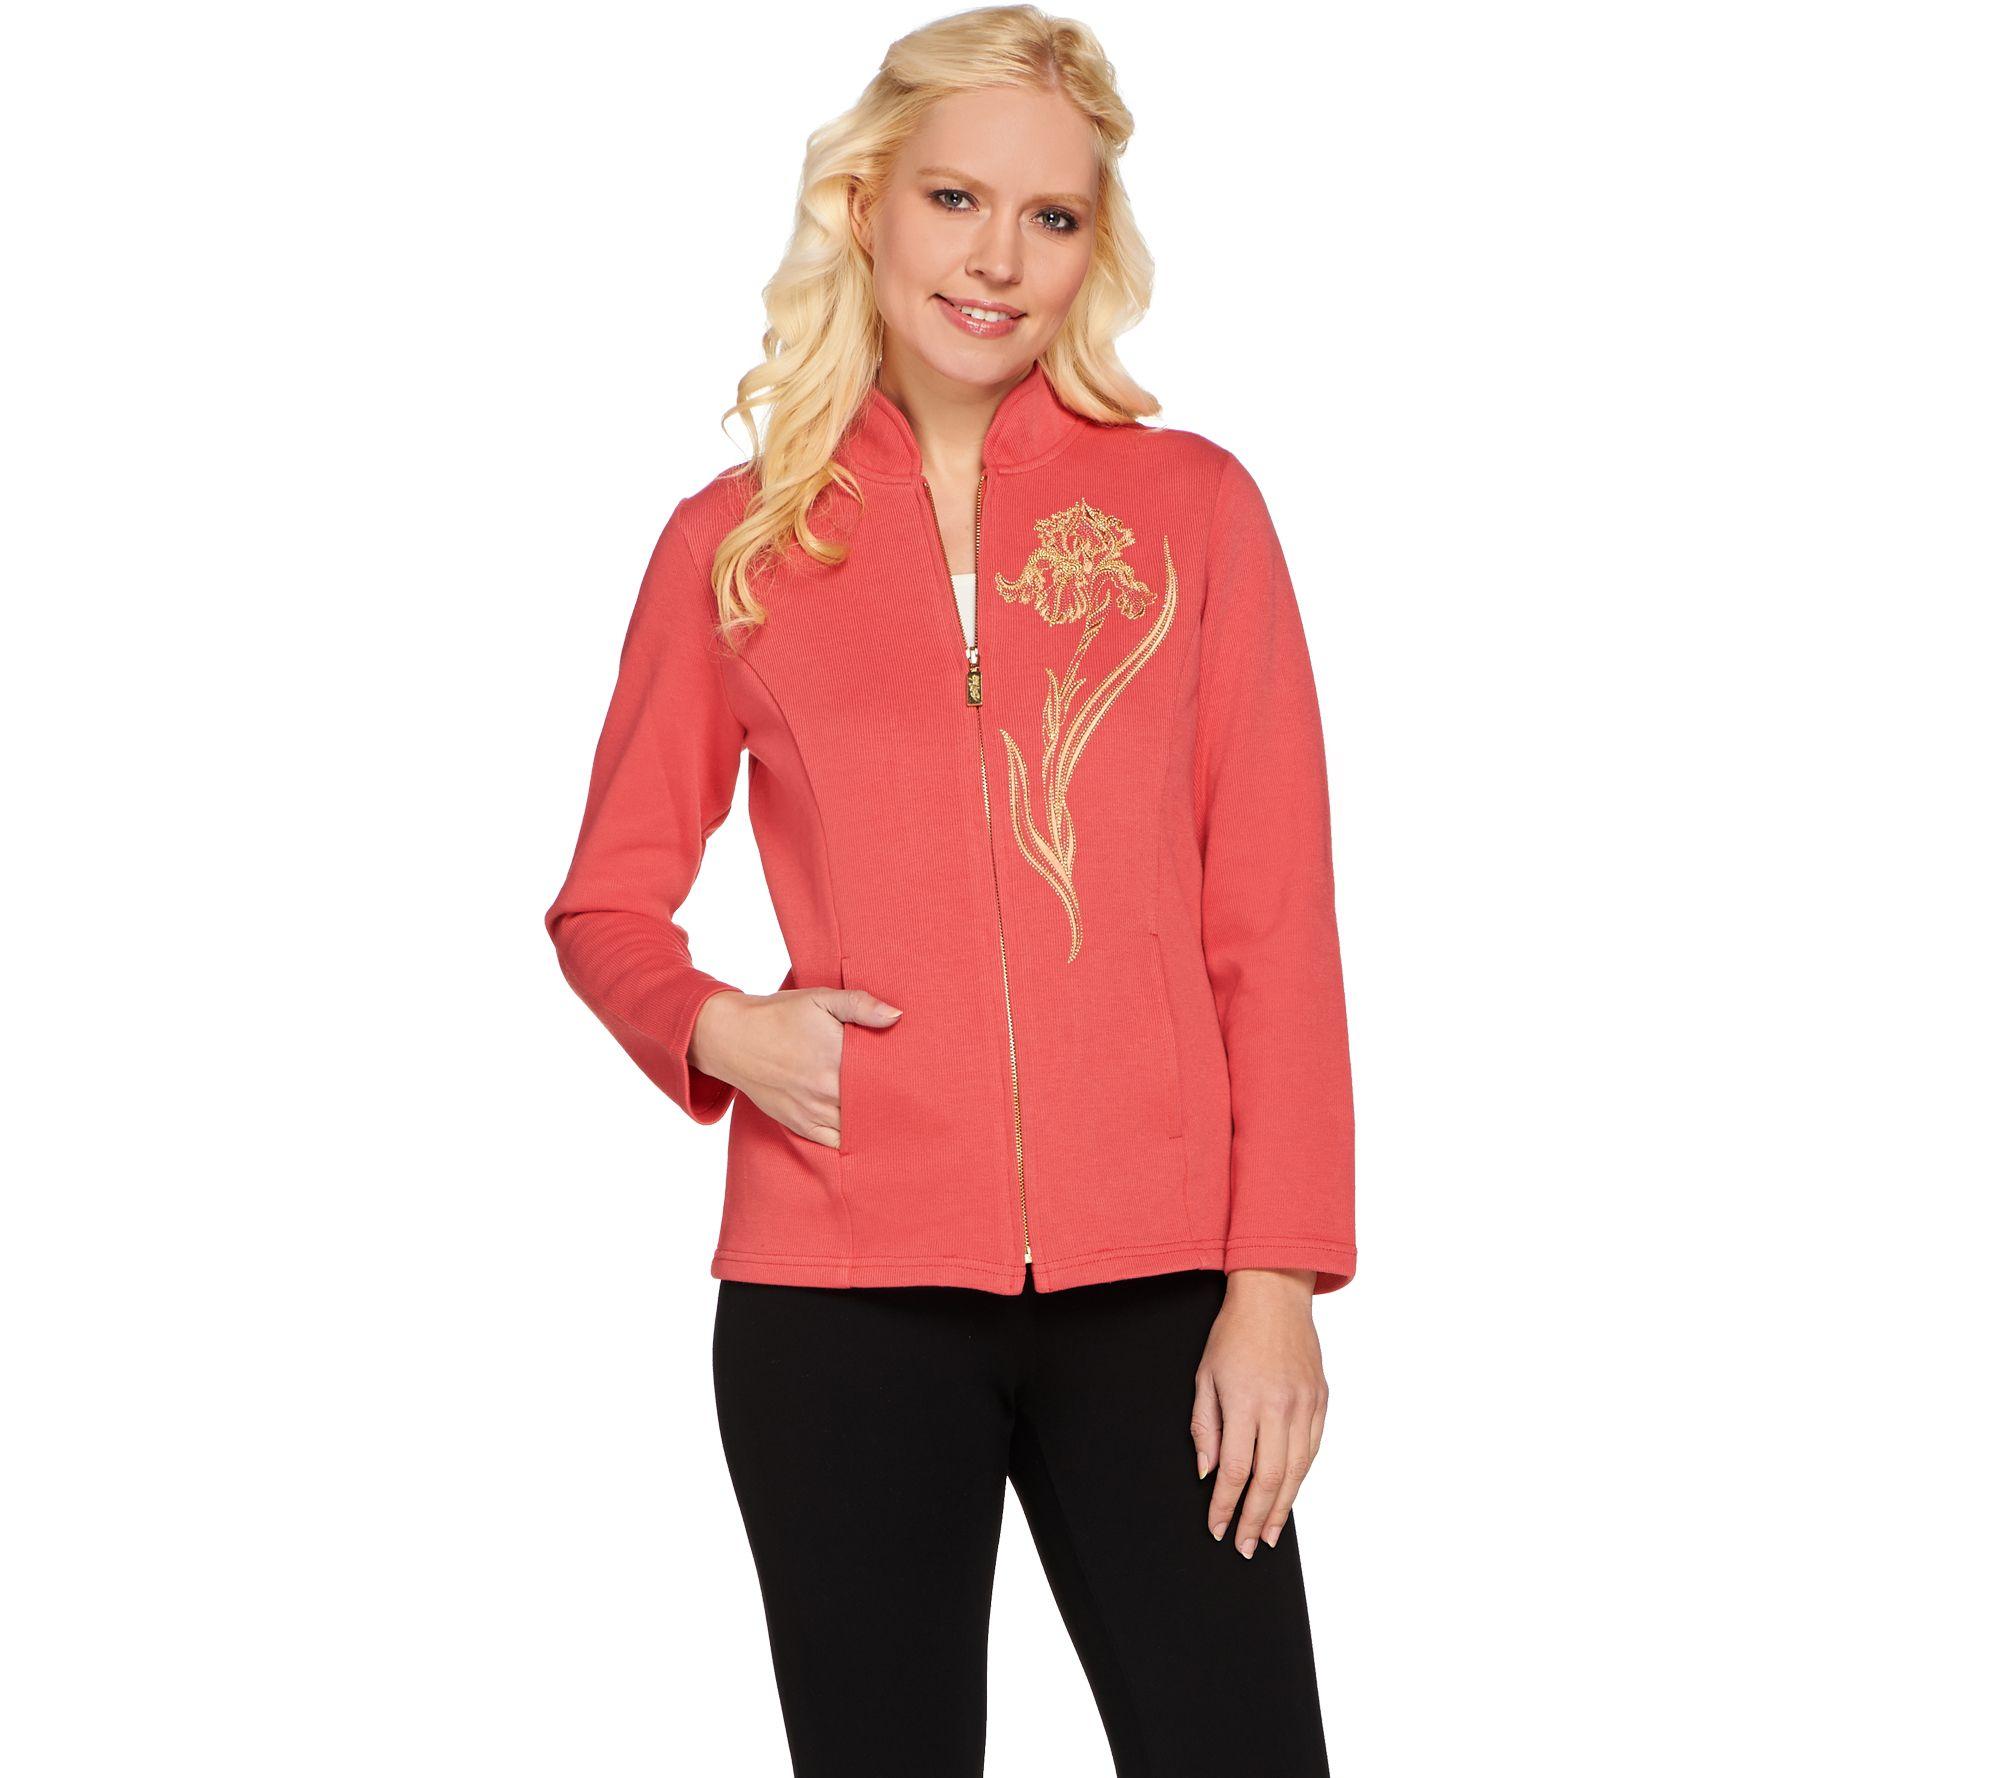 bob mackie u0026 39 s embroidered iris zip front jacket